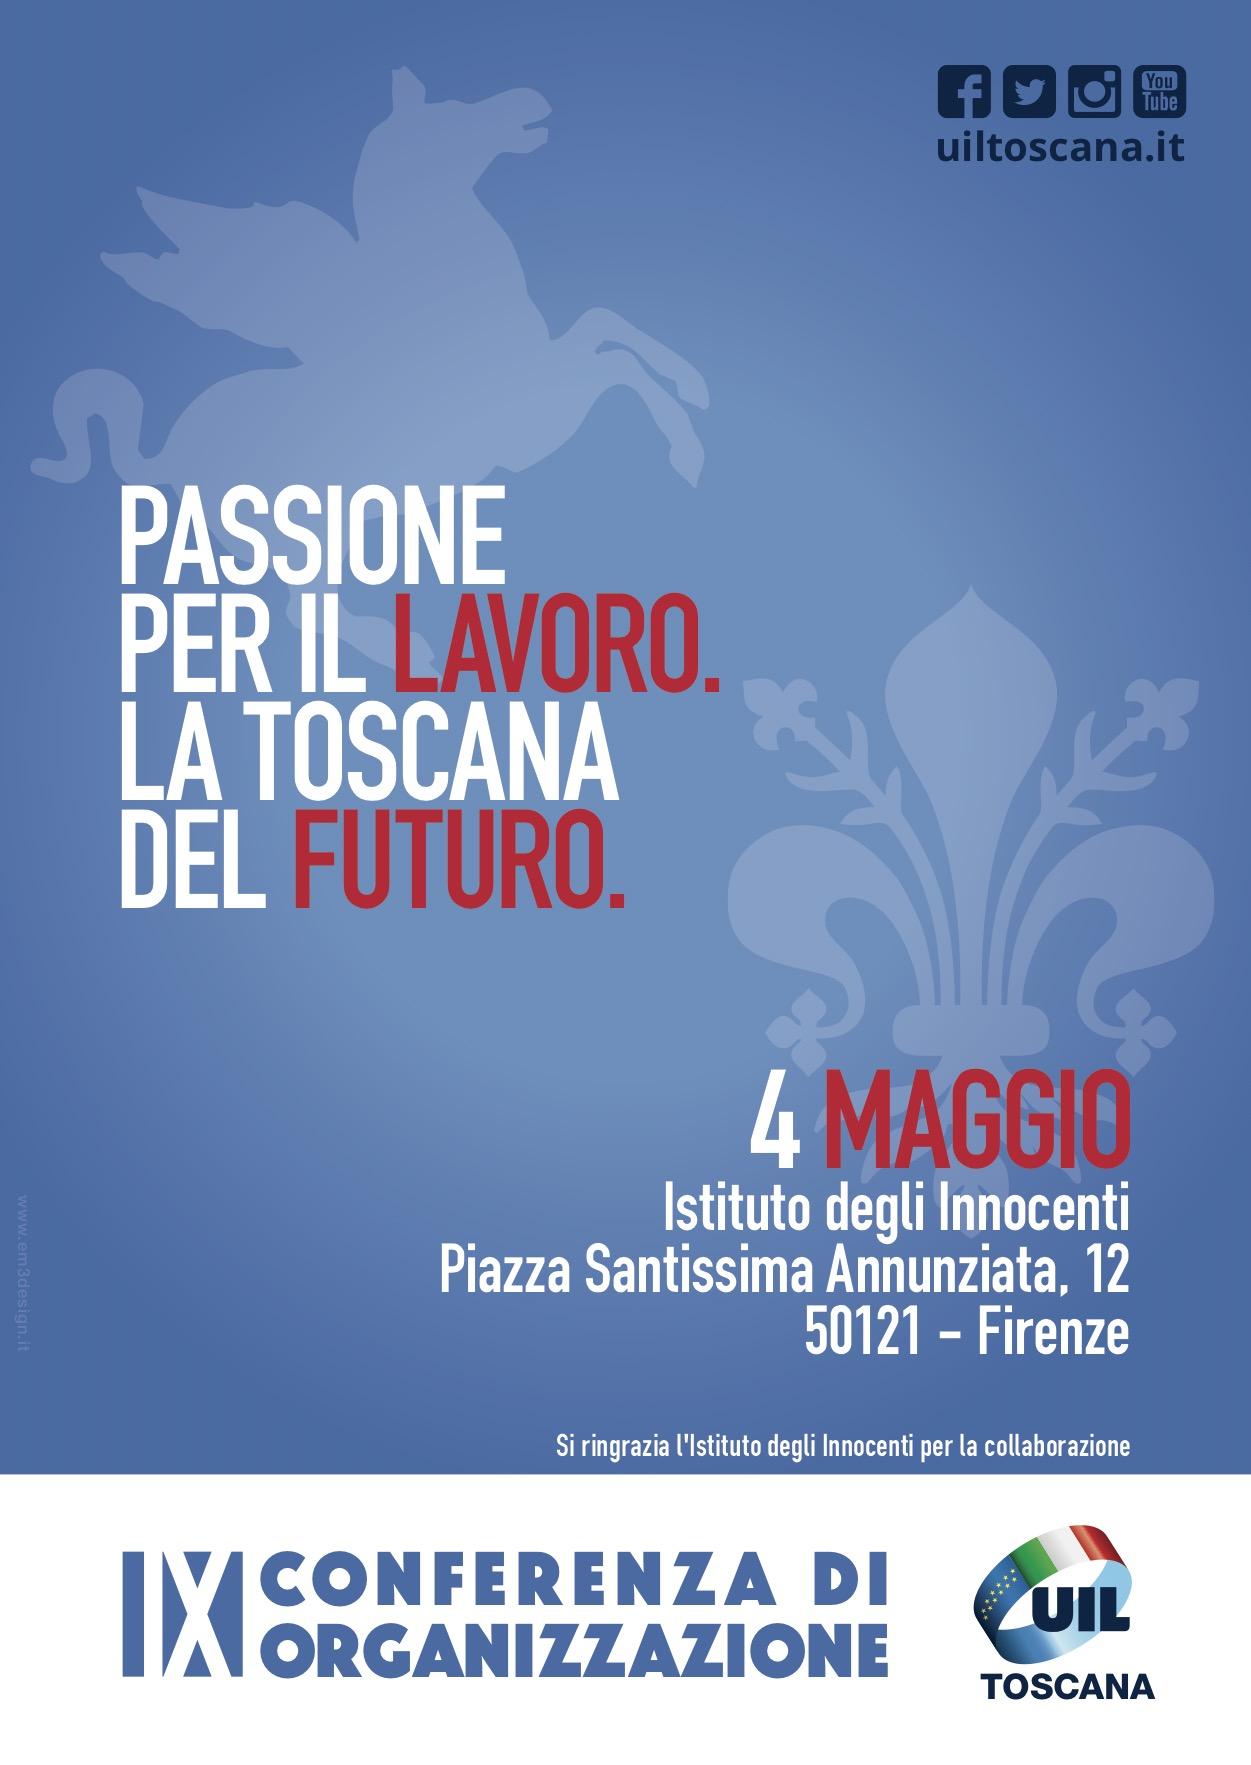 IX Conferenza di Organizzazione Uil Toscana